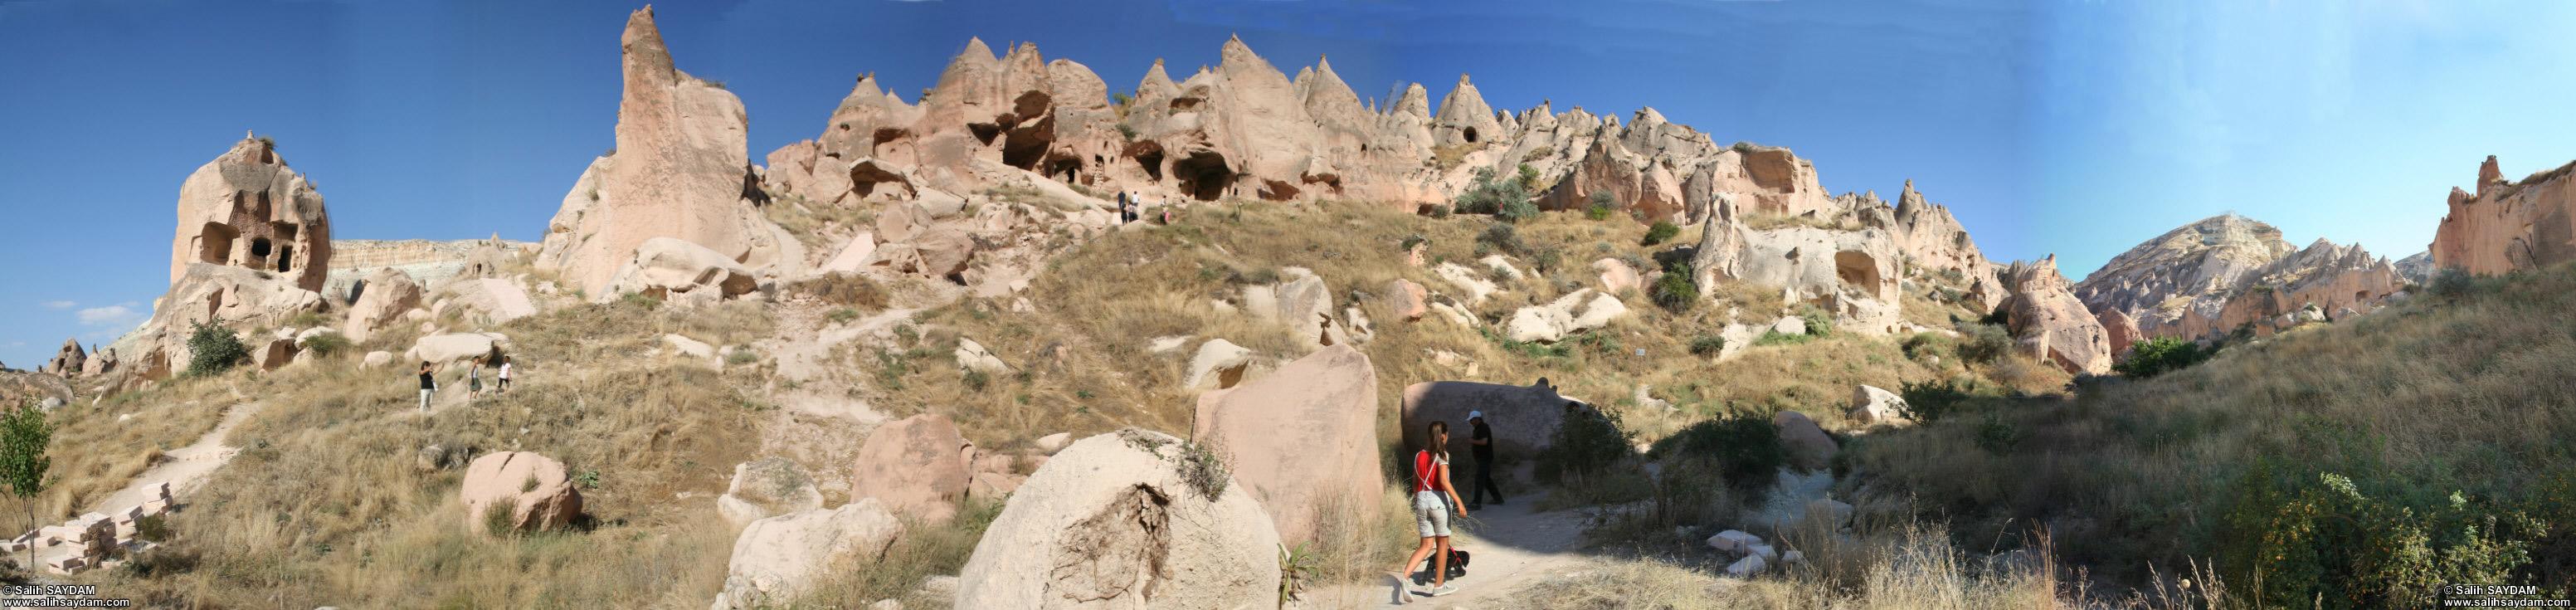 01 >> Panorama of Zelve 1 (Nevsehir, Cappadocia)